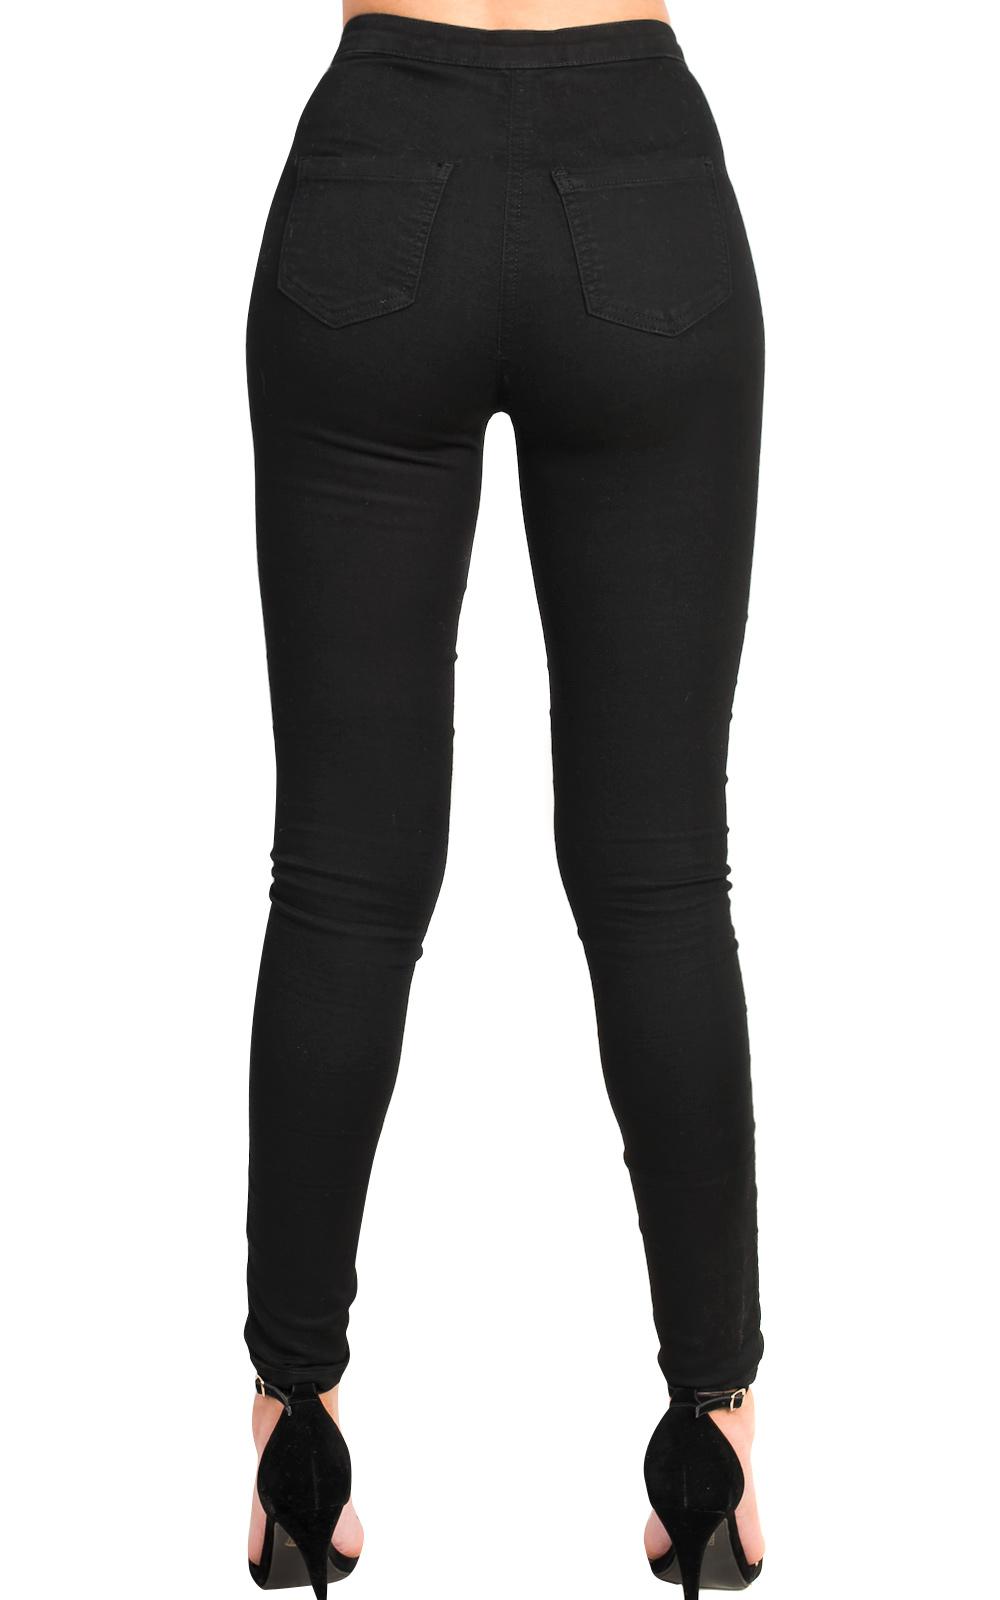 skinny jeans ebay women s ladies stunning lace up skinny jeans ebay. Black Bedroom Furniture Sets. Home Design Ideas